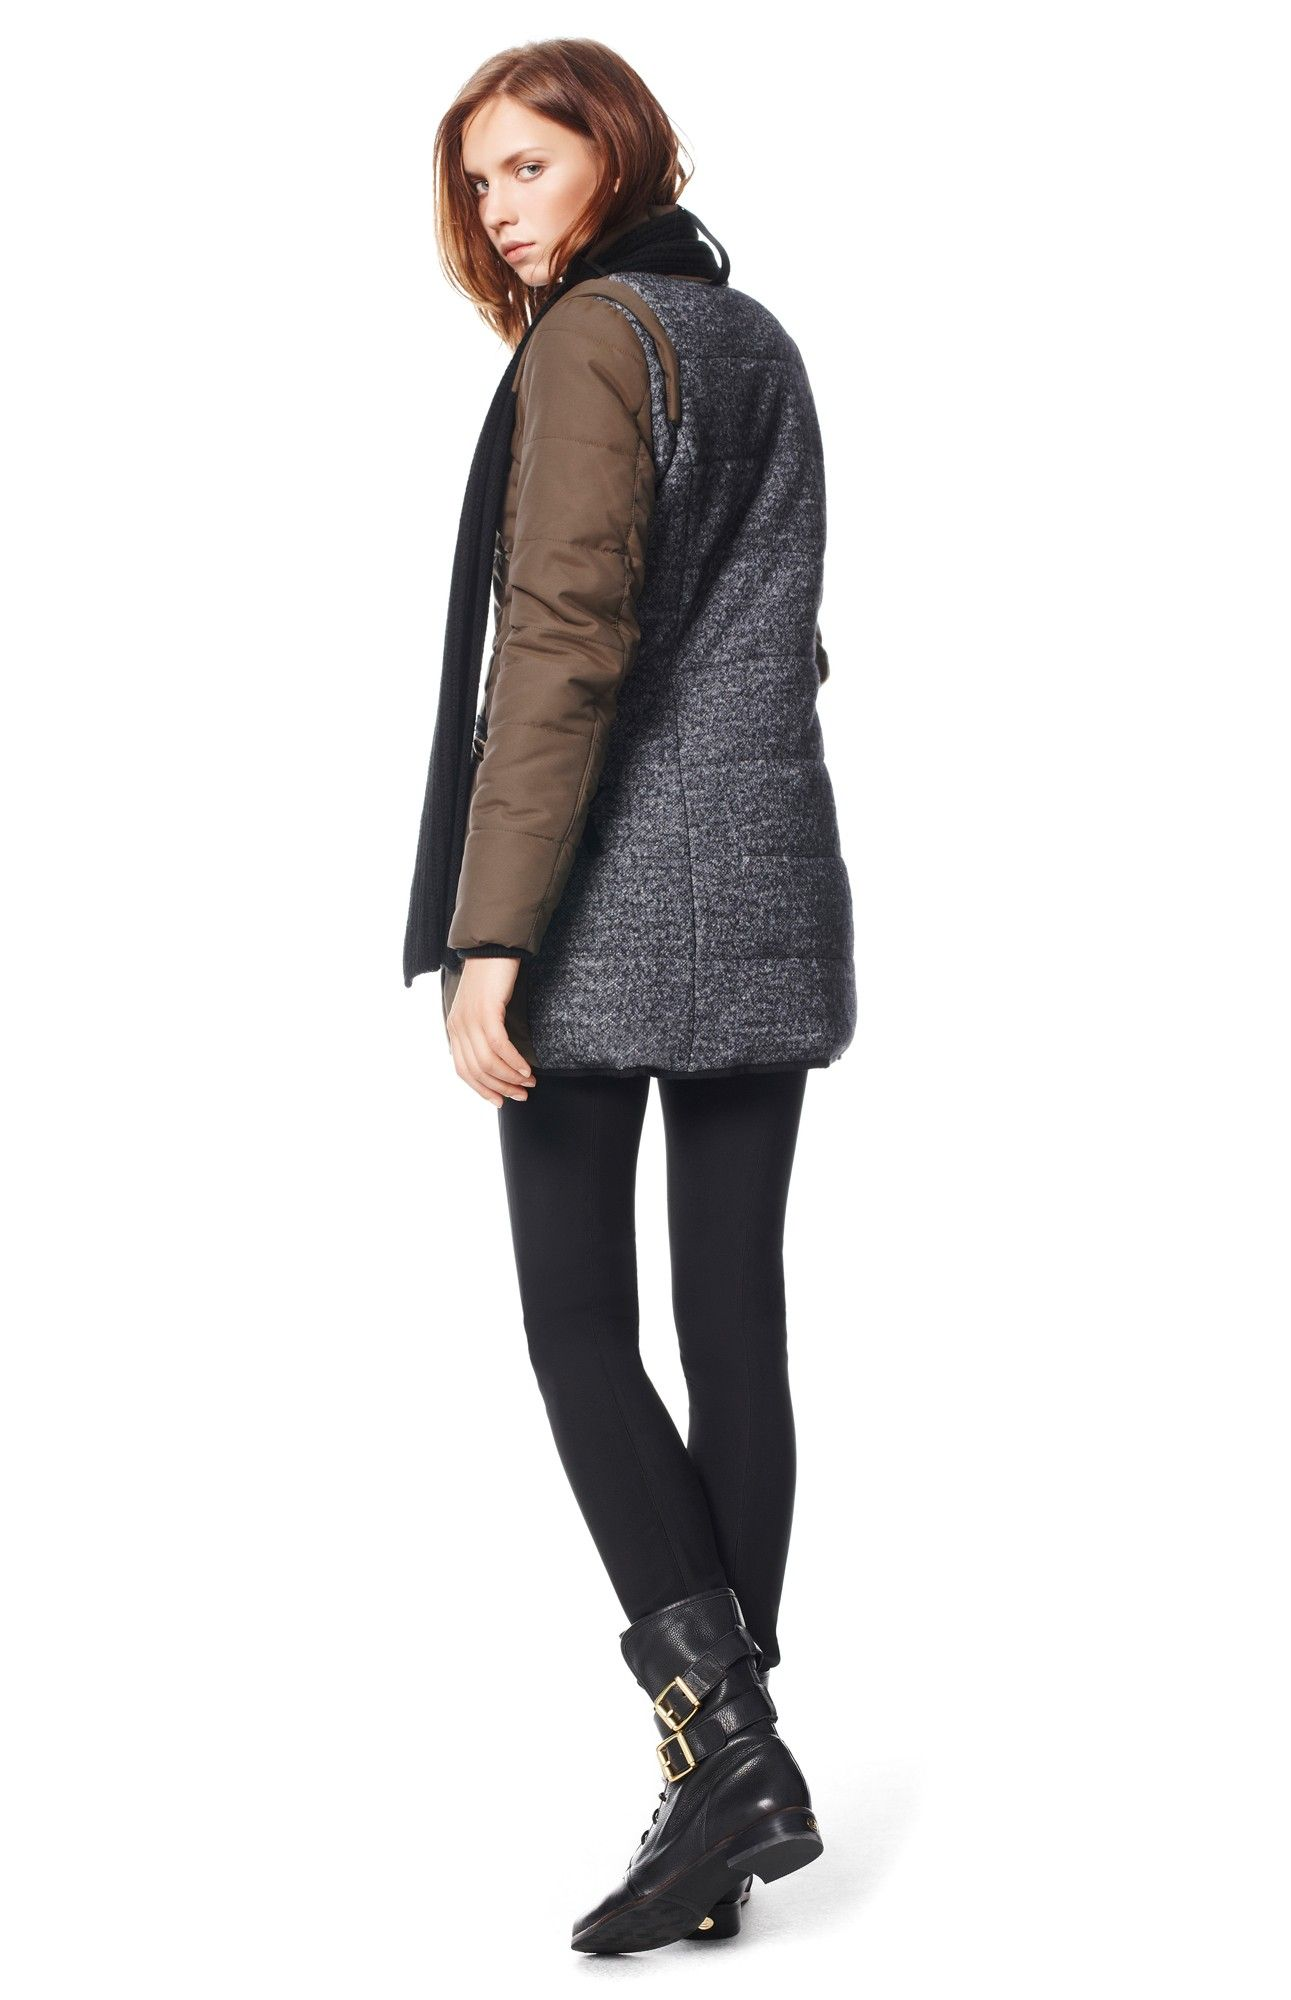 Chaquet n efecto bufanda prendas de abrigo adolfo for Abrigos adolfo dominguez outlet